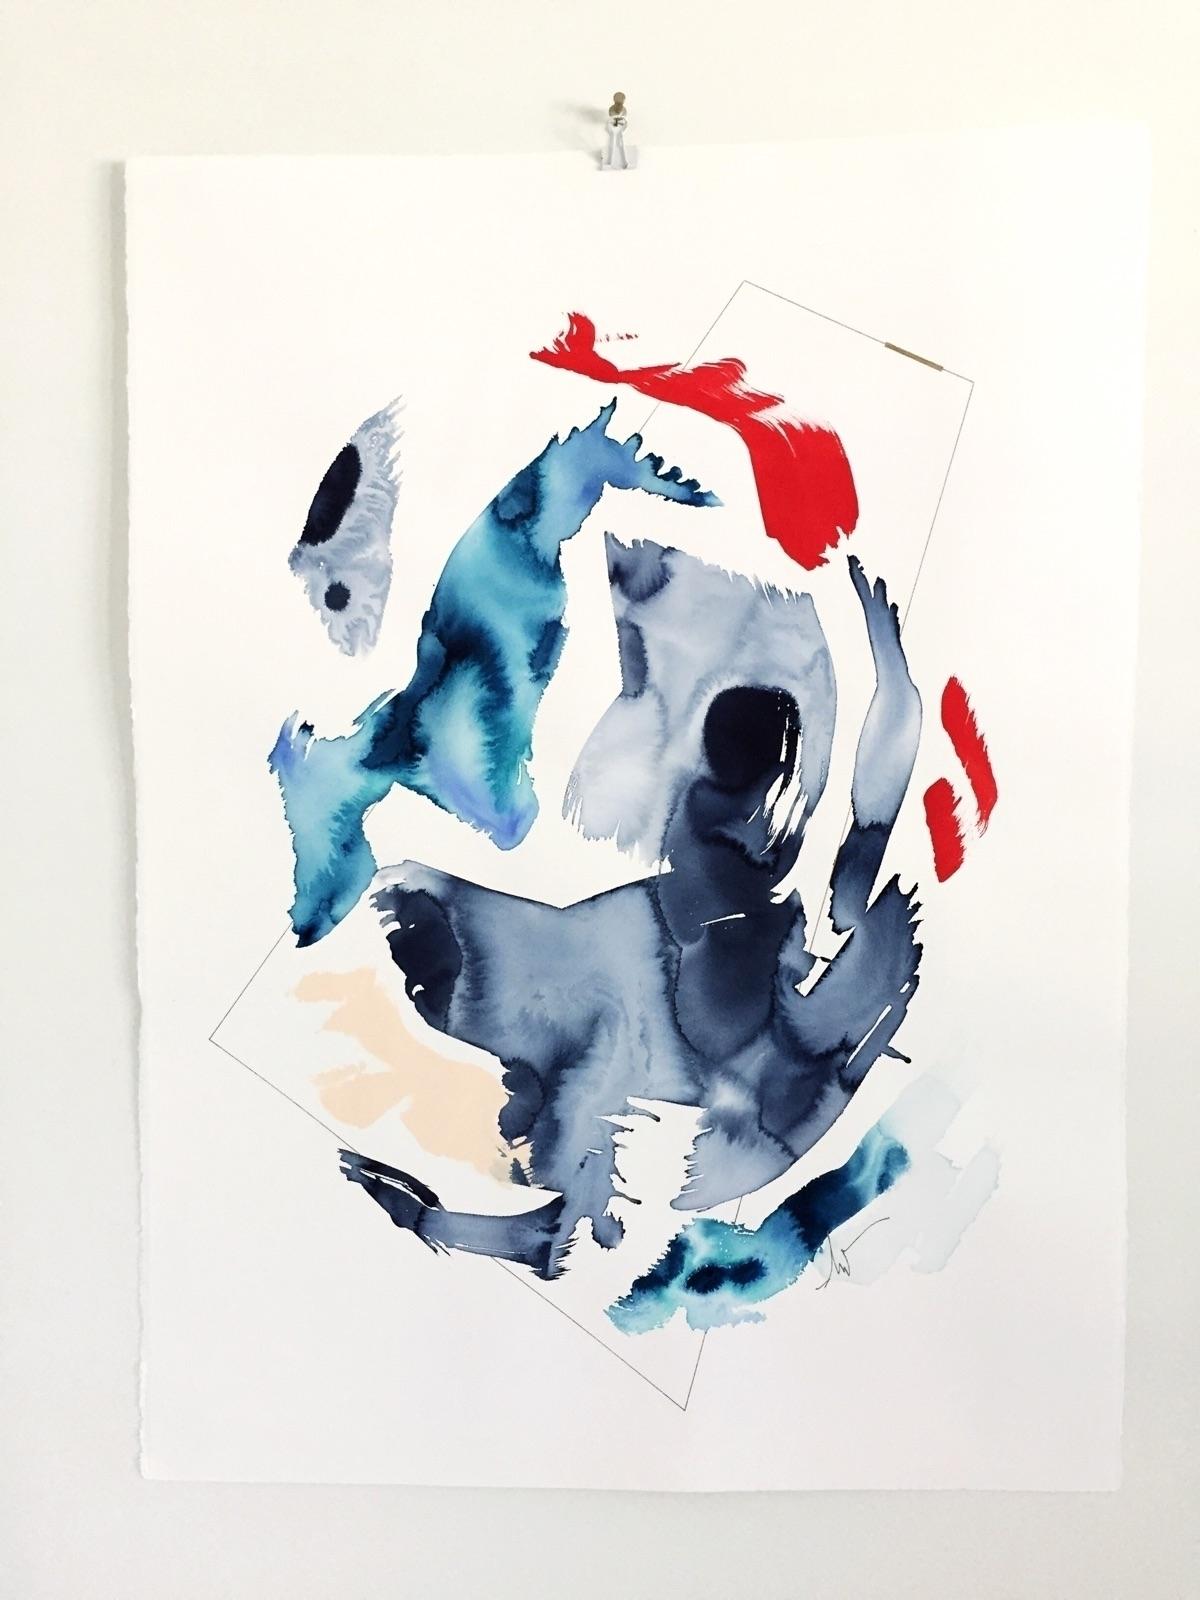 Chaos order. line  - ellomakers - ebw_artwork | ello